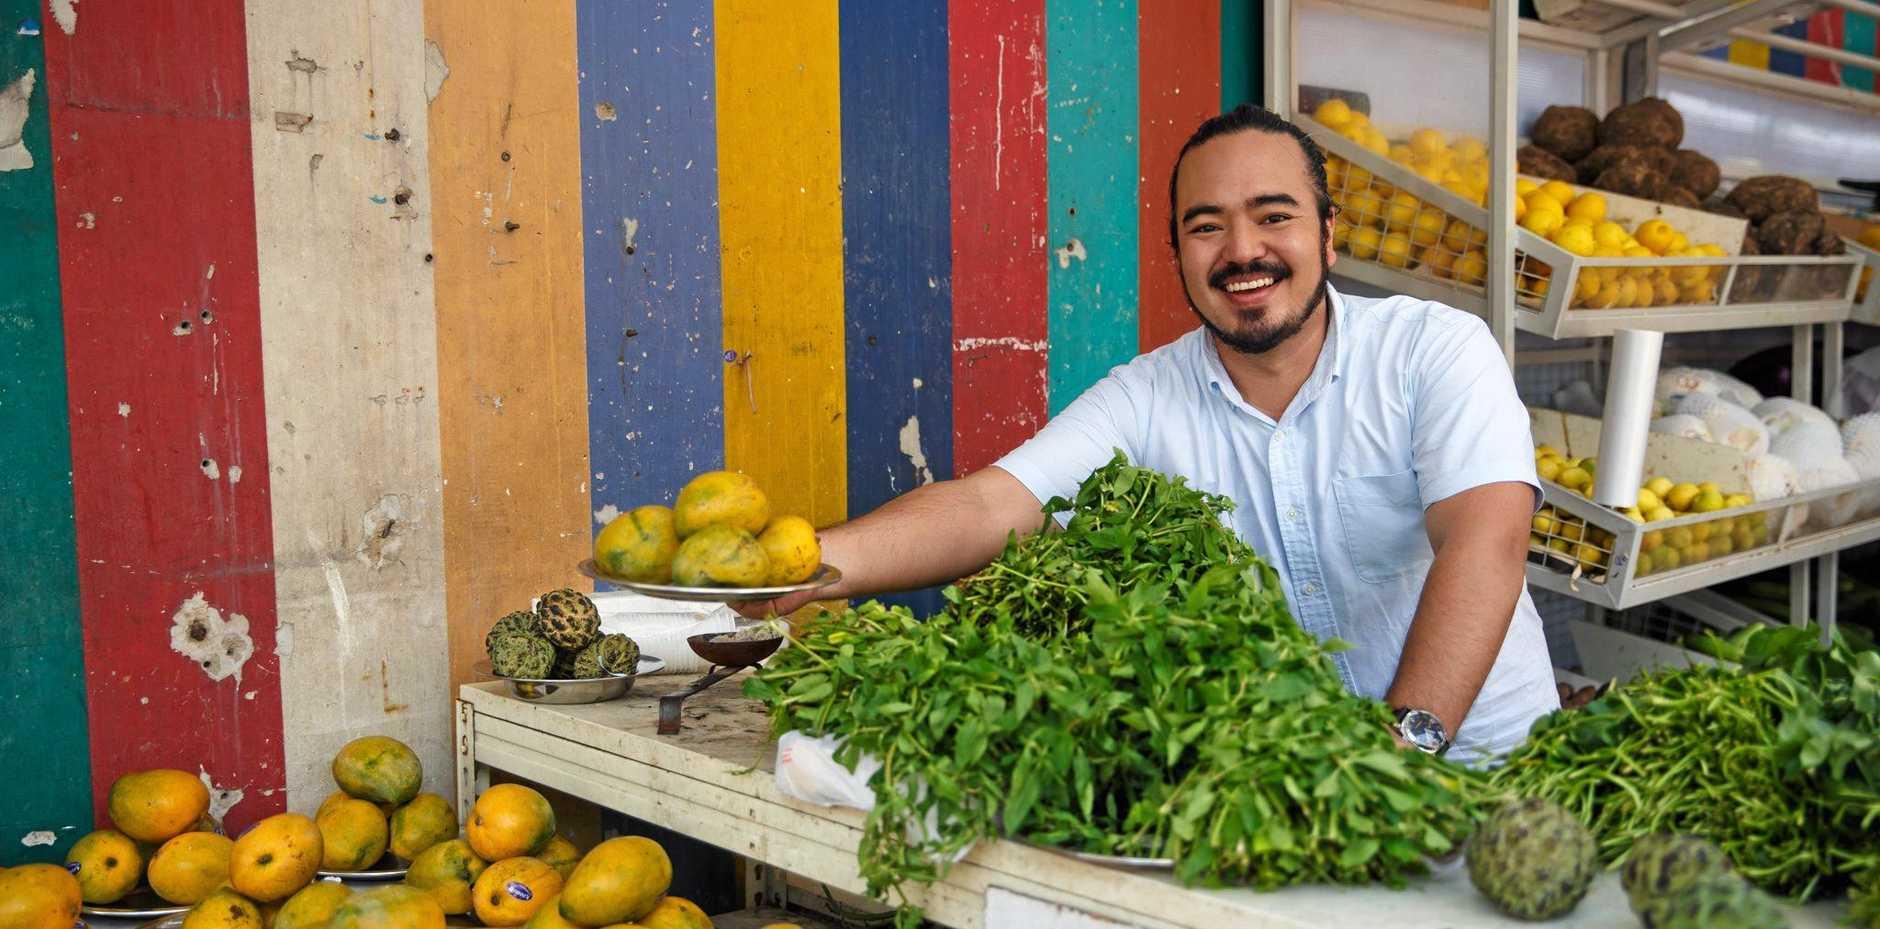 DESTINATION FLAVOUR: Celebrity chef Adam Liaw explores Singapore to reveal the secrets of its cuisine.